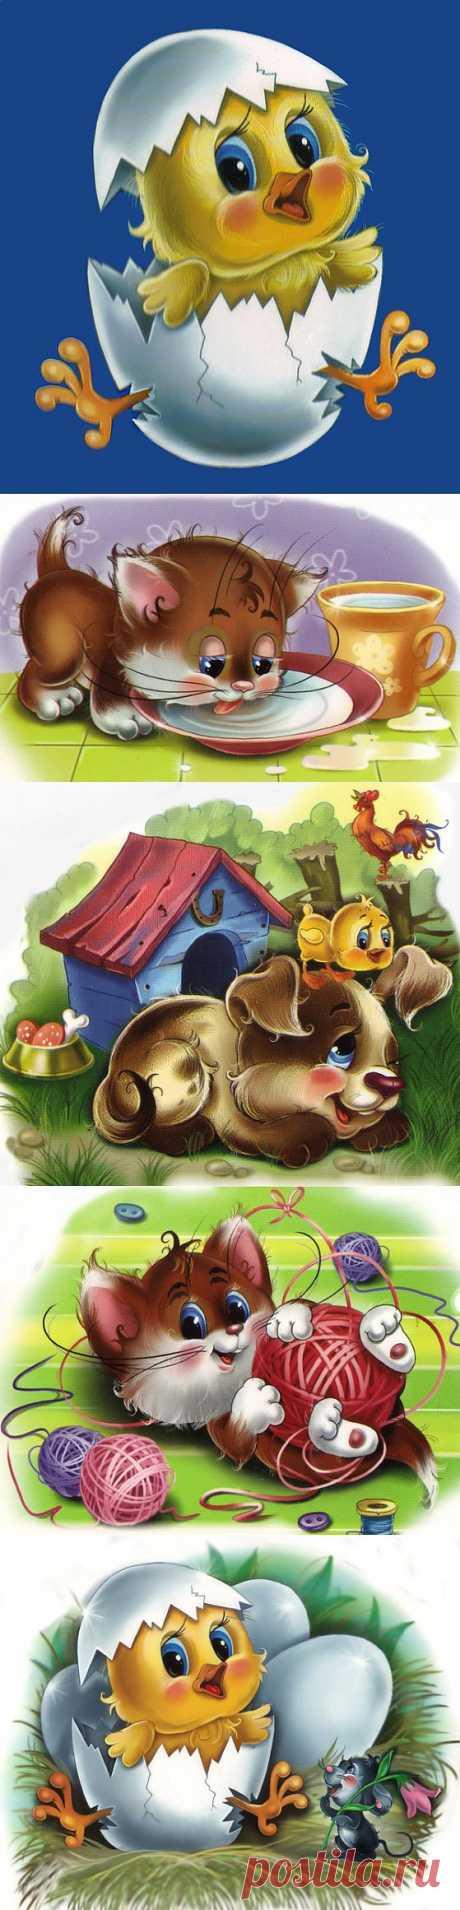 Картинки для деток Г.Цукавина.